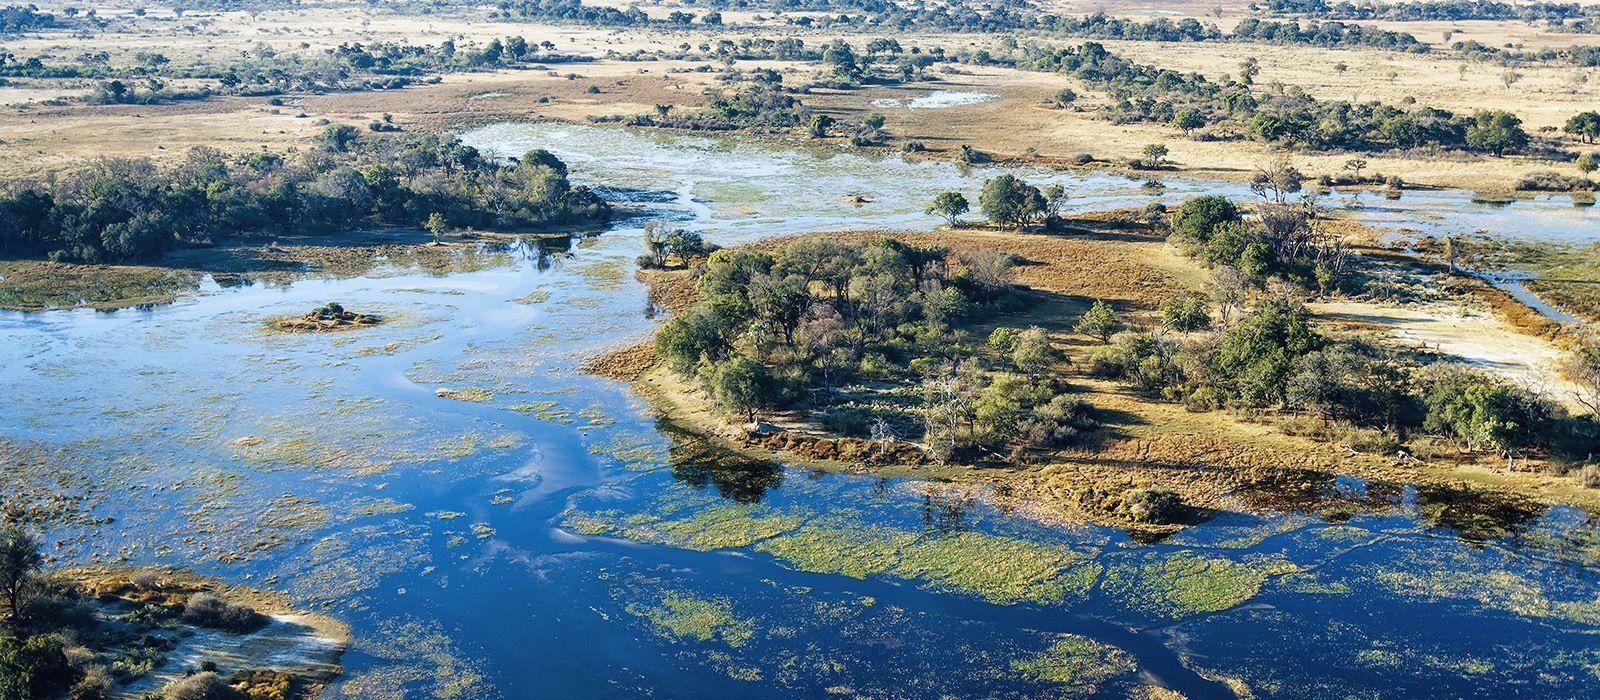 Cape Town, Okavango Delta & Victoria Falls Tour Trip 2